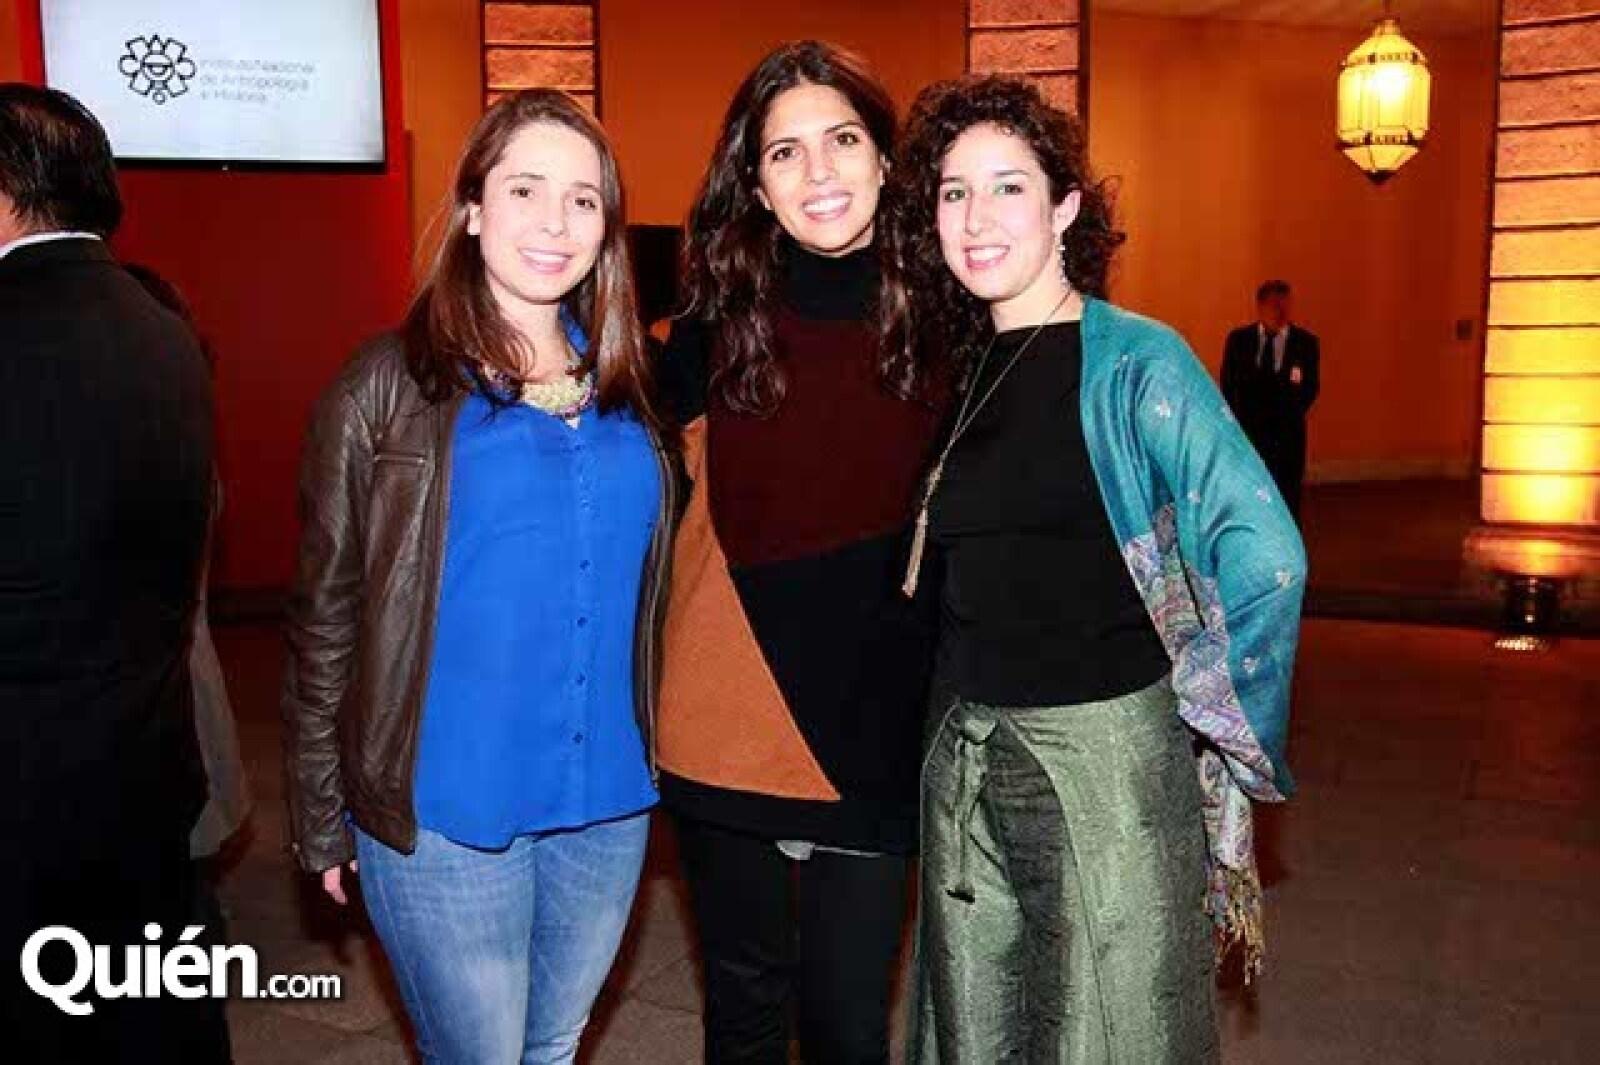 Othiana Roffiel,Andrea Villers y Andrea Bustillos